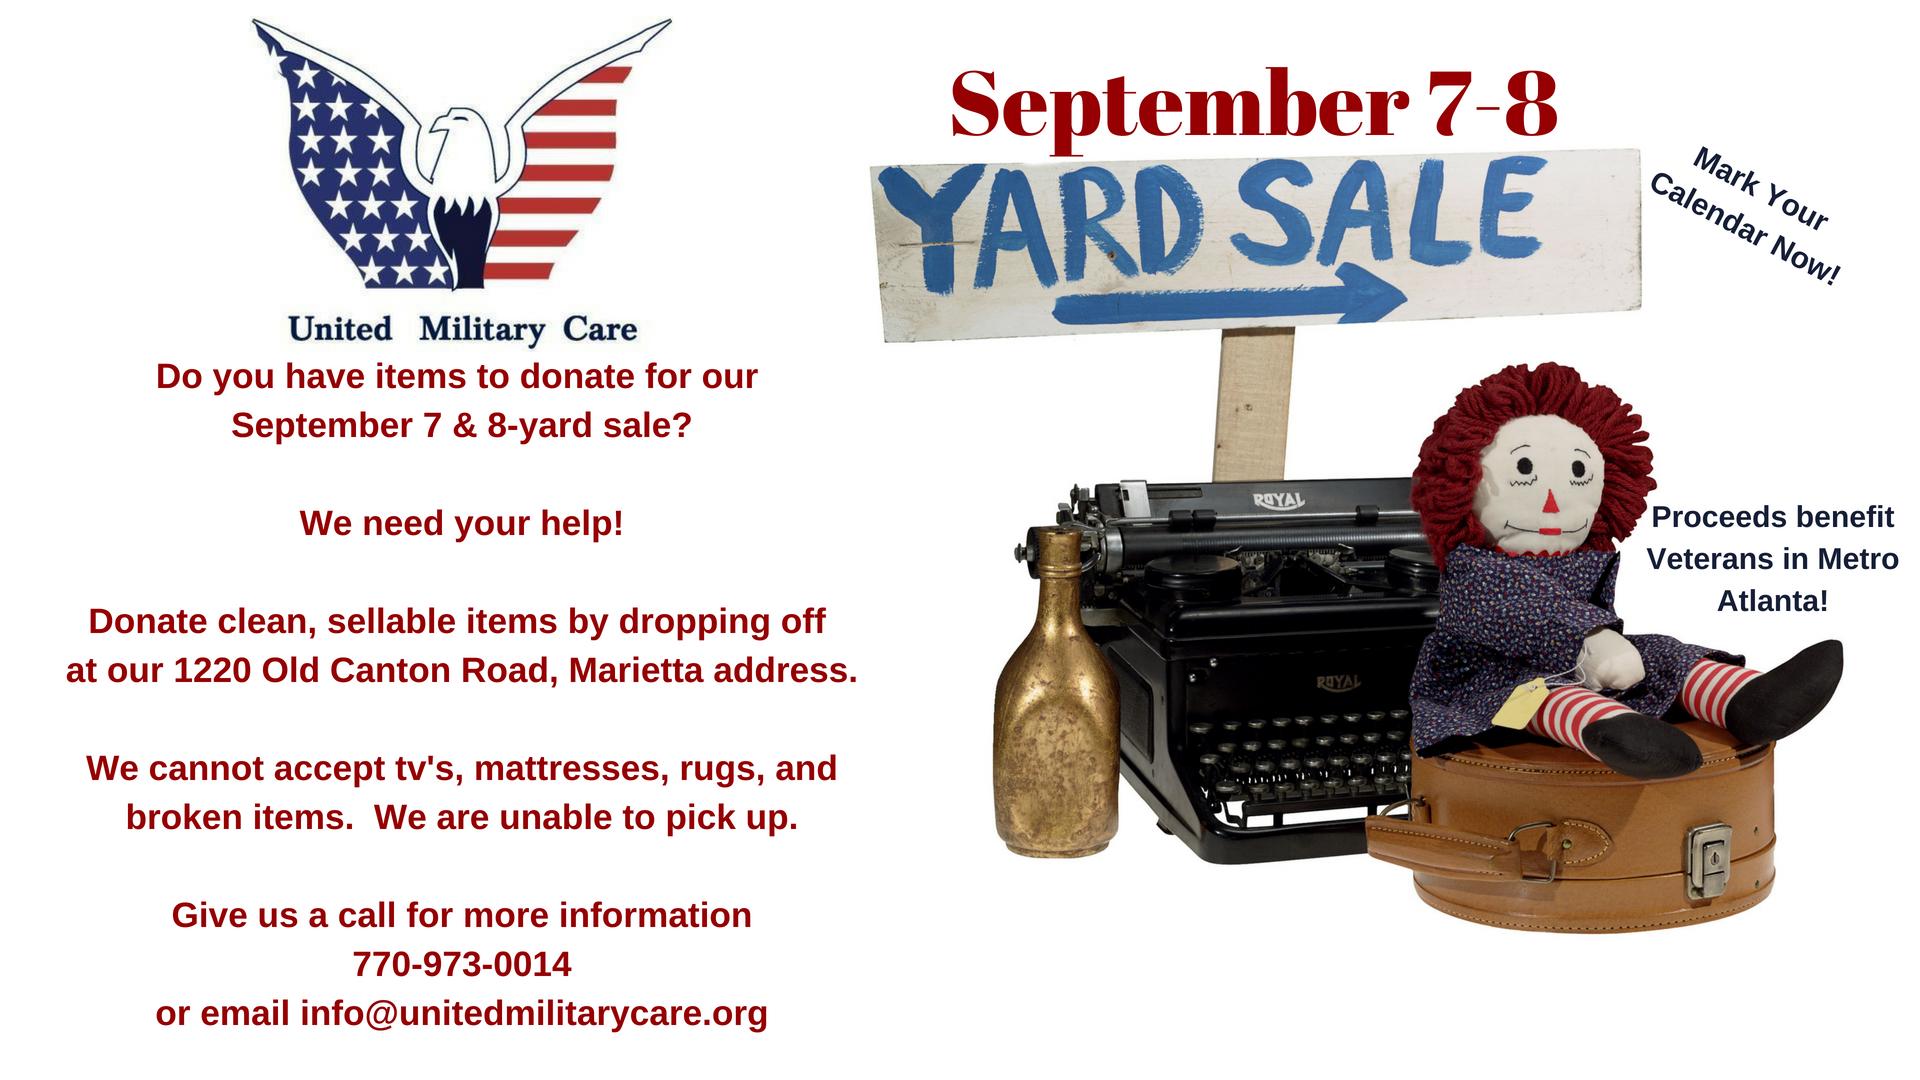 9/8 Yard Sale! | United Military Care Military Nonprofit